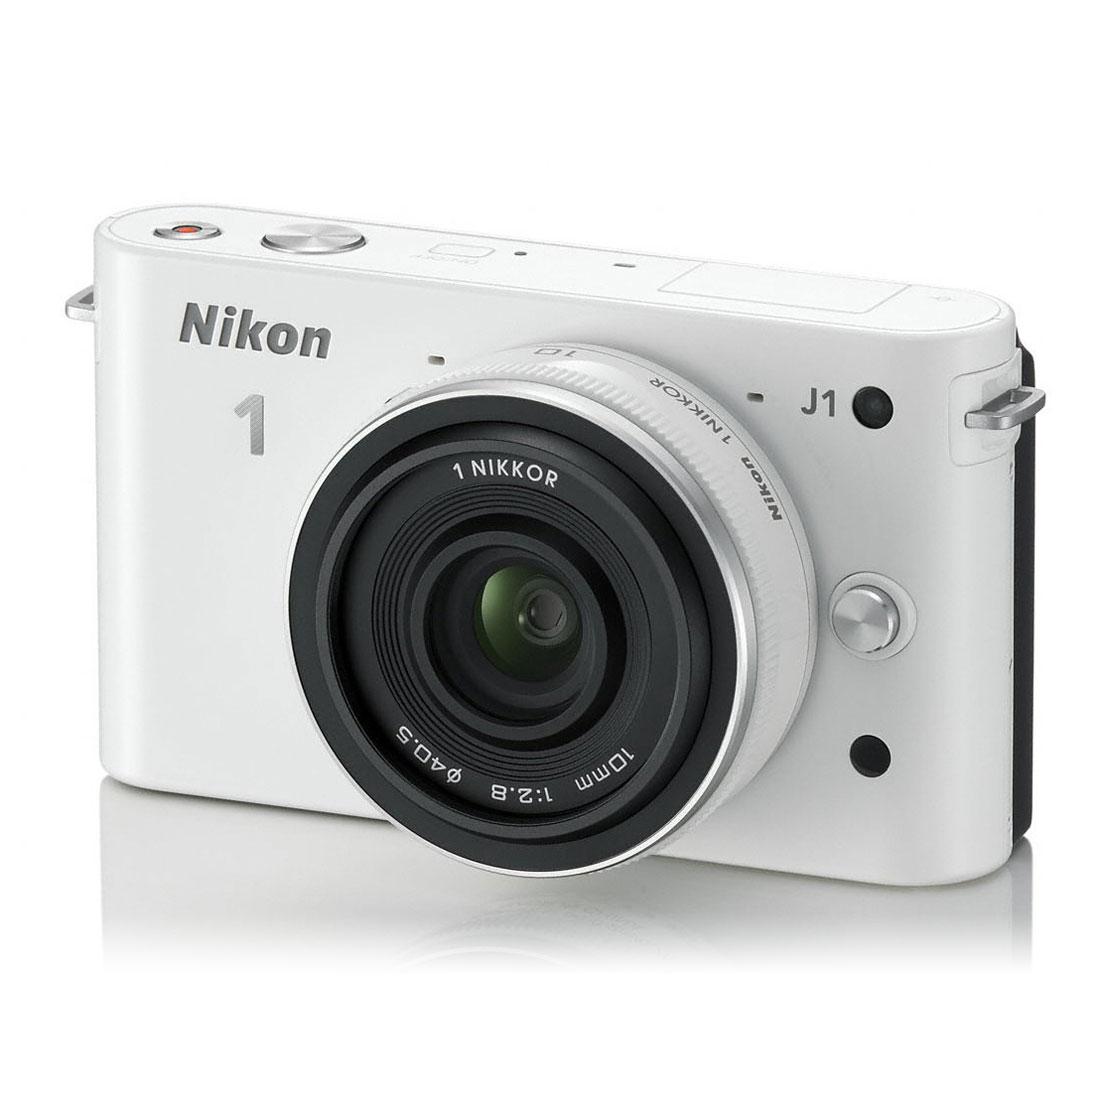 nikon 1 j1 blanc objectif 1 nikkor 10 mm f 2 8 appareil photo hybride nikon sur ldlc. Black Bedroom Furniture Sets. Home Design Ideas